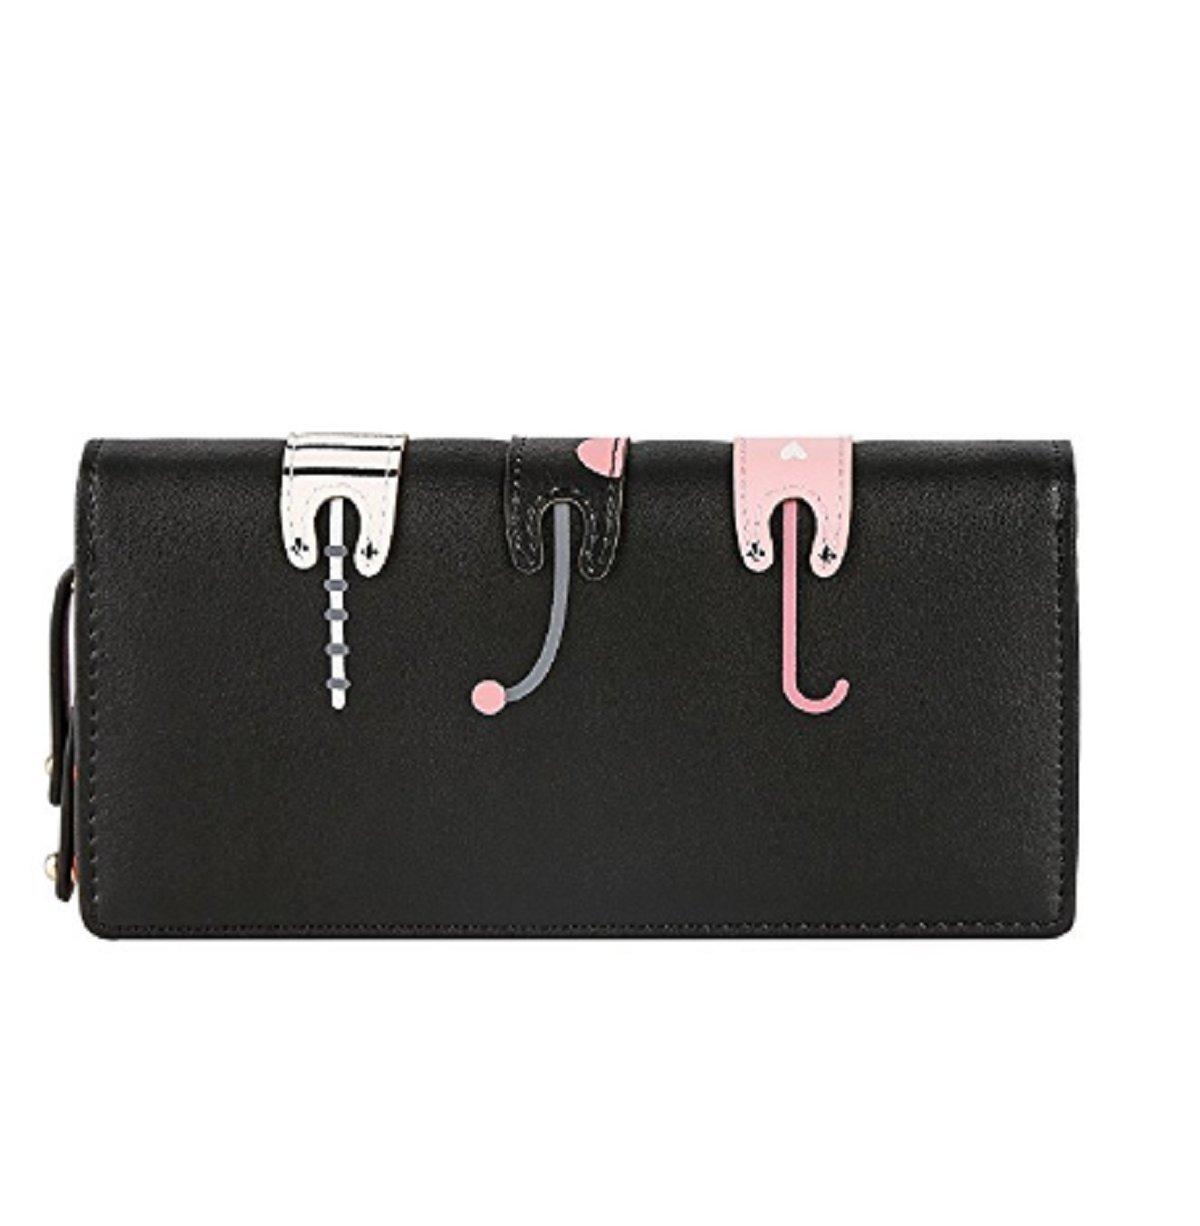 Womens Wallet Cute Cat Wallet Coin Purse Bifold Long Purse with Zipper Black